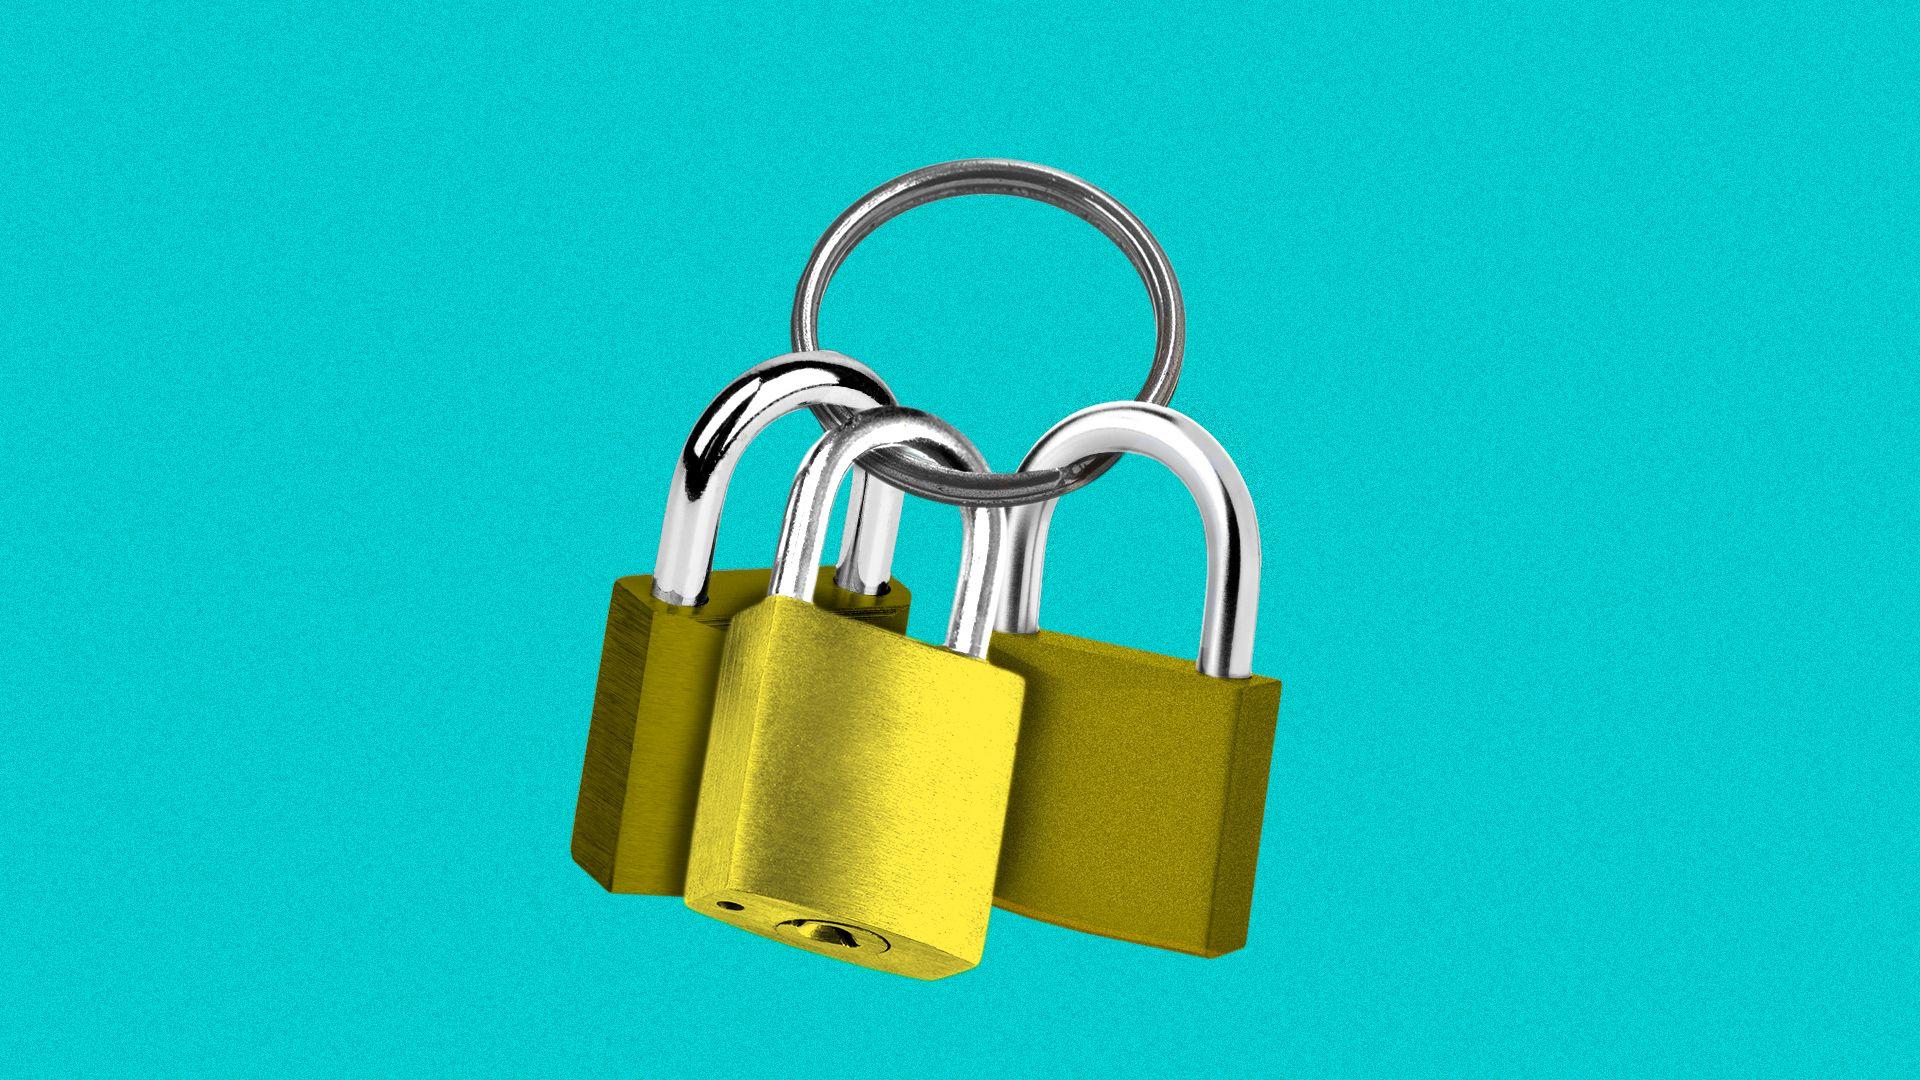 Illustration of a keyring with padlocks.